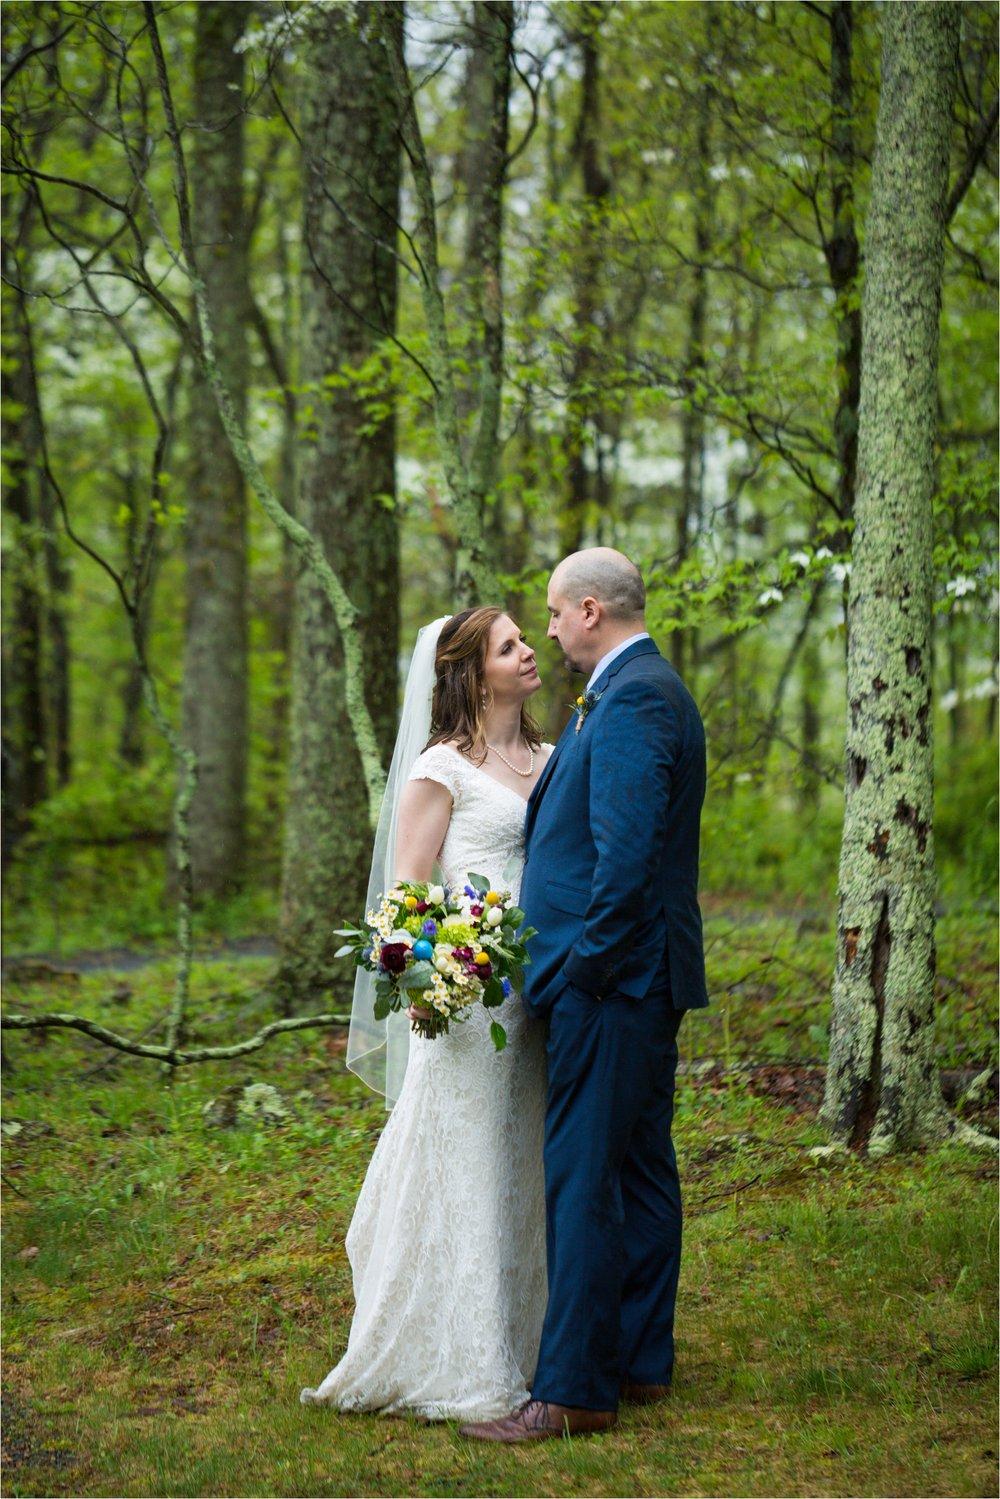 Lydia-Mountain-Spring-Virginia-Wedding-0524.jpg